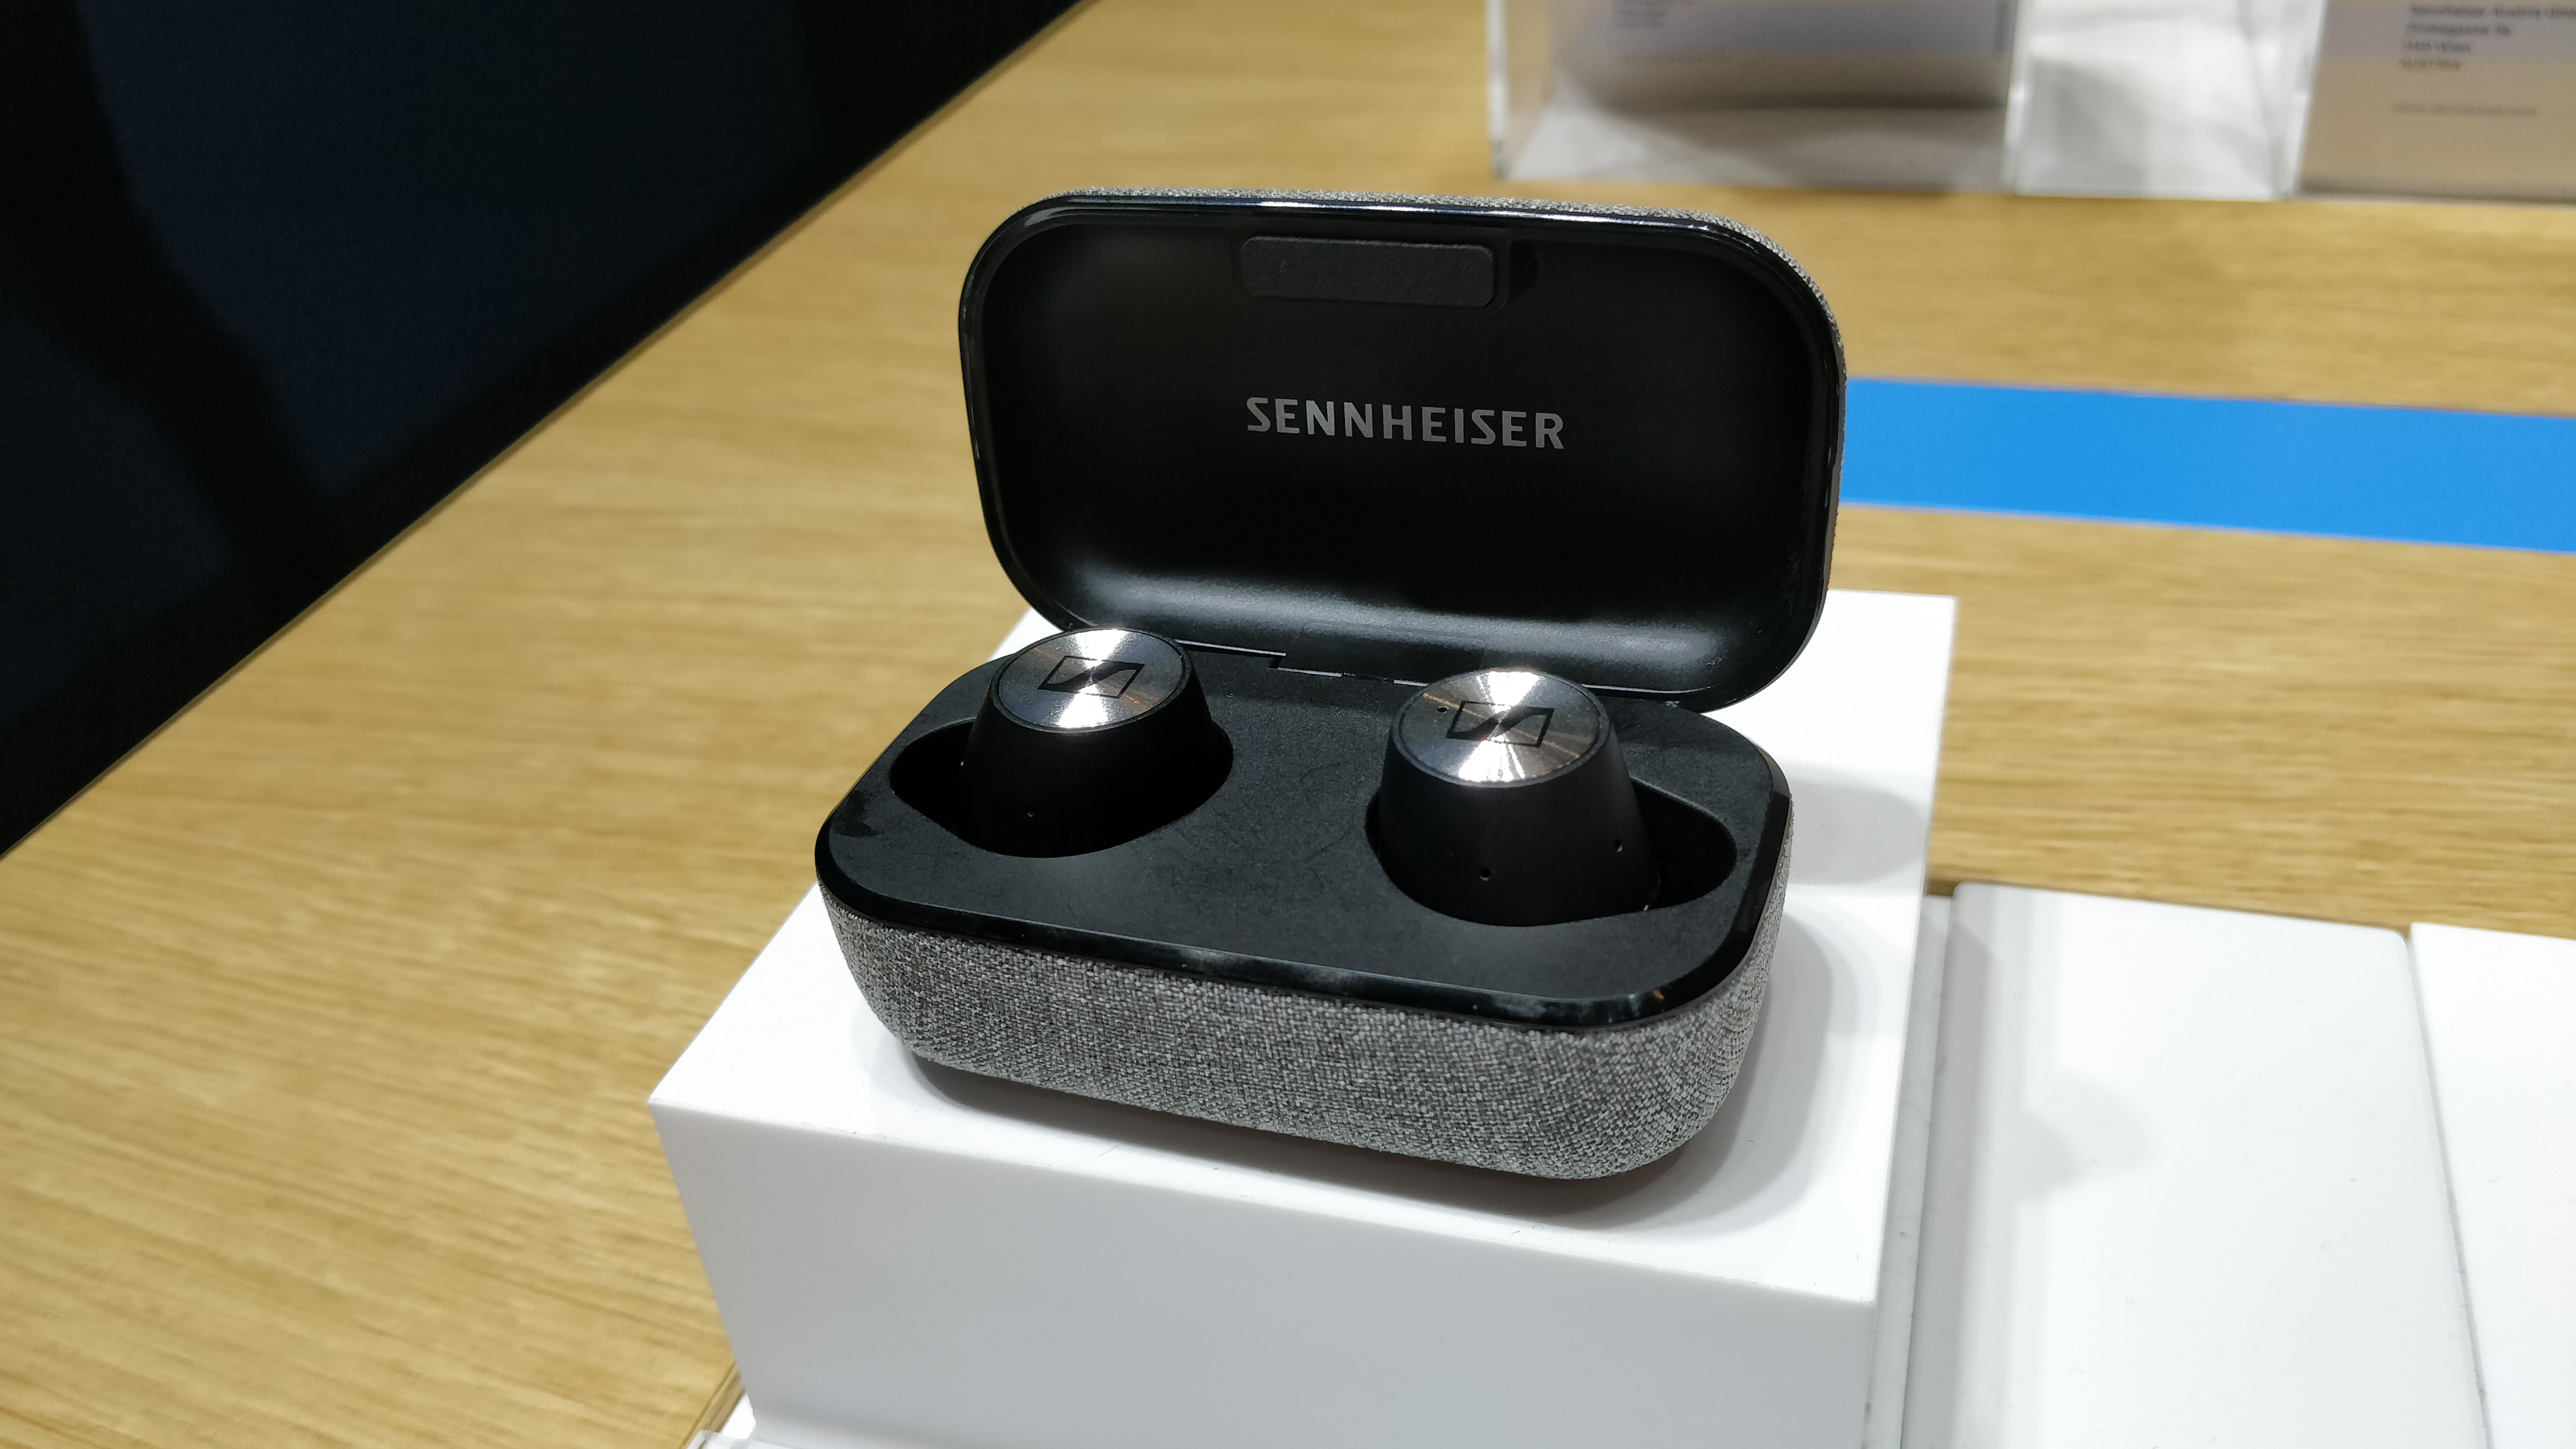 Sennheiser Momentum True Wireless in case